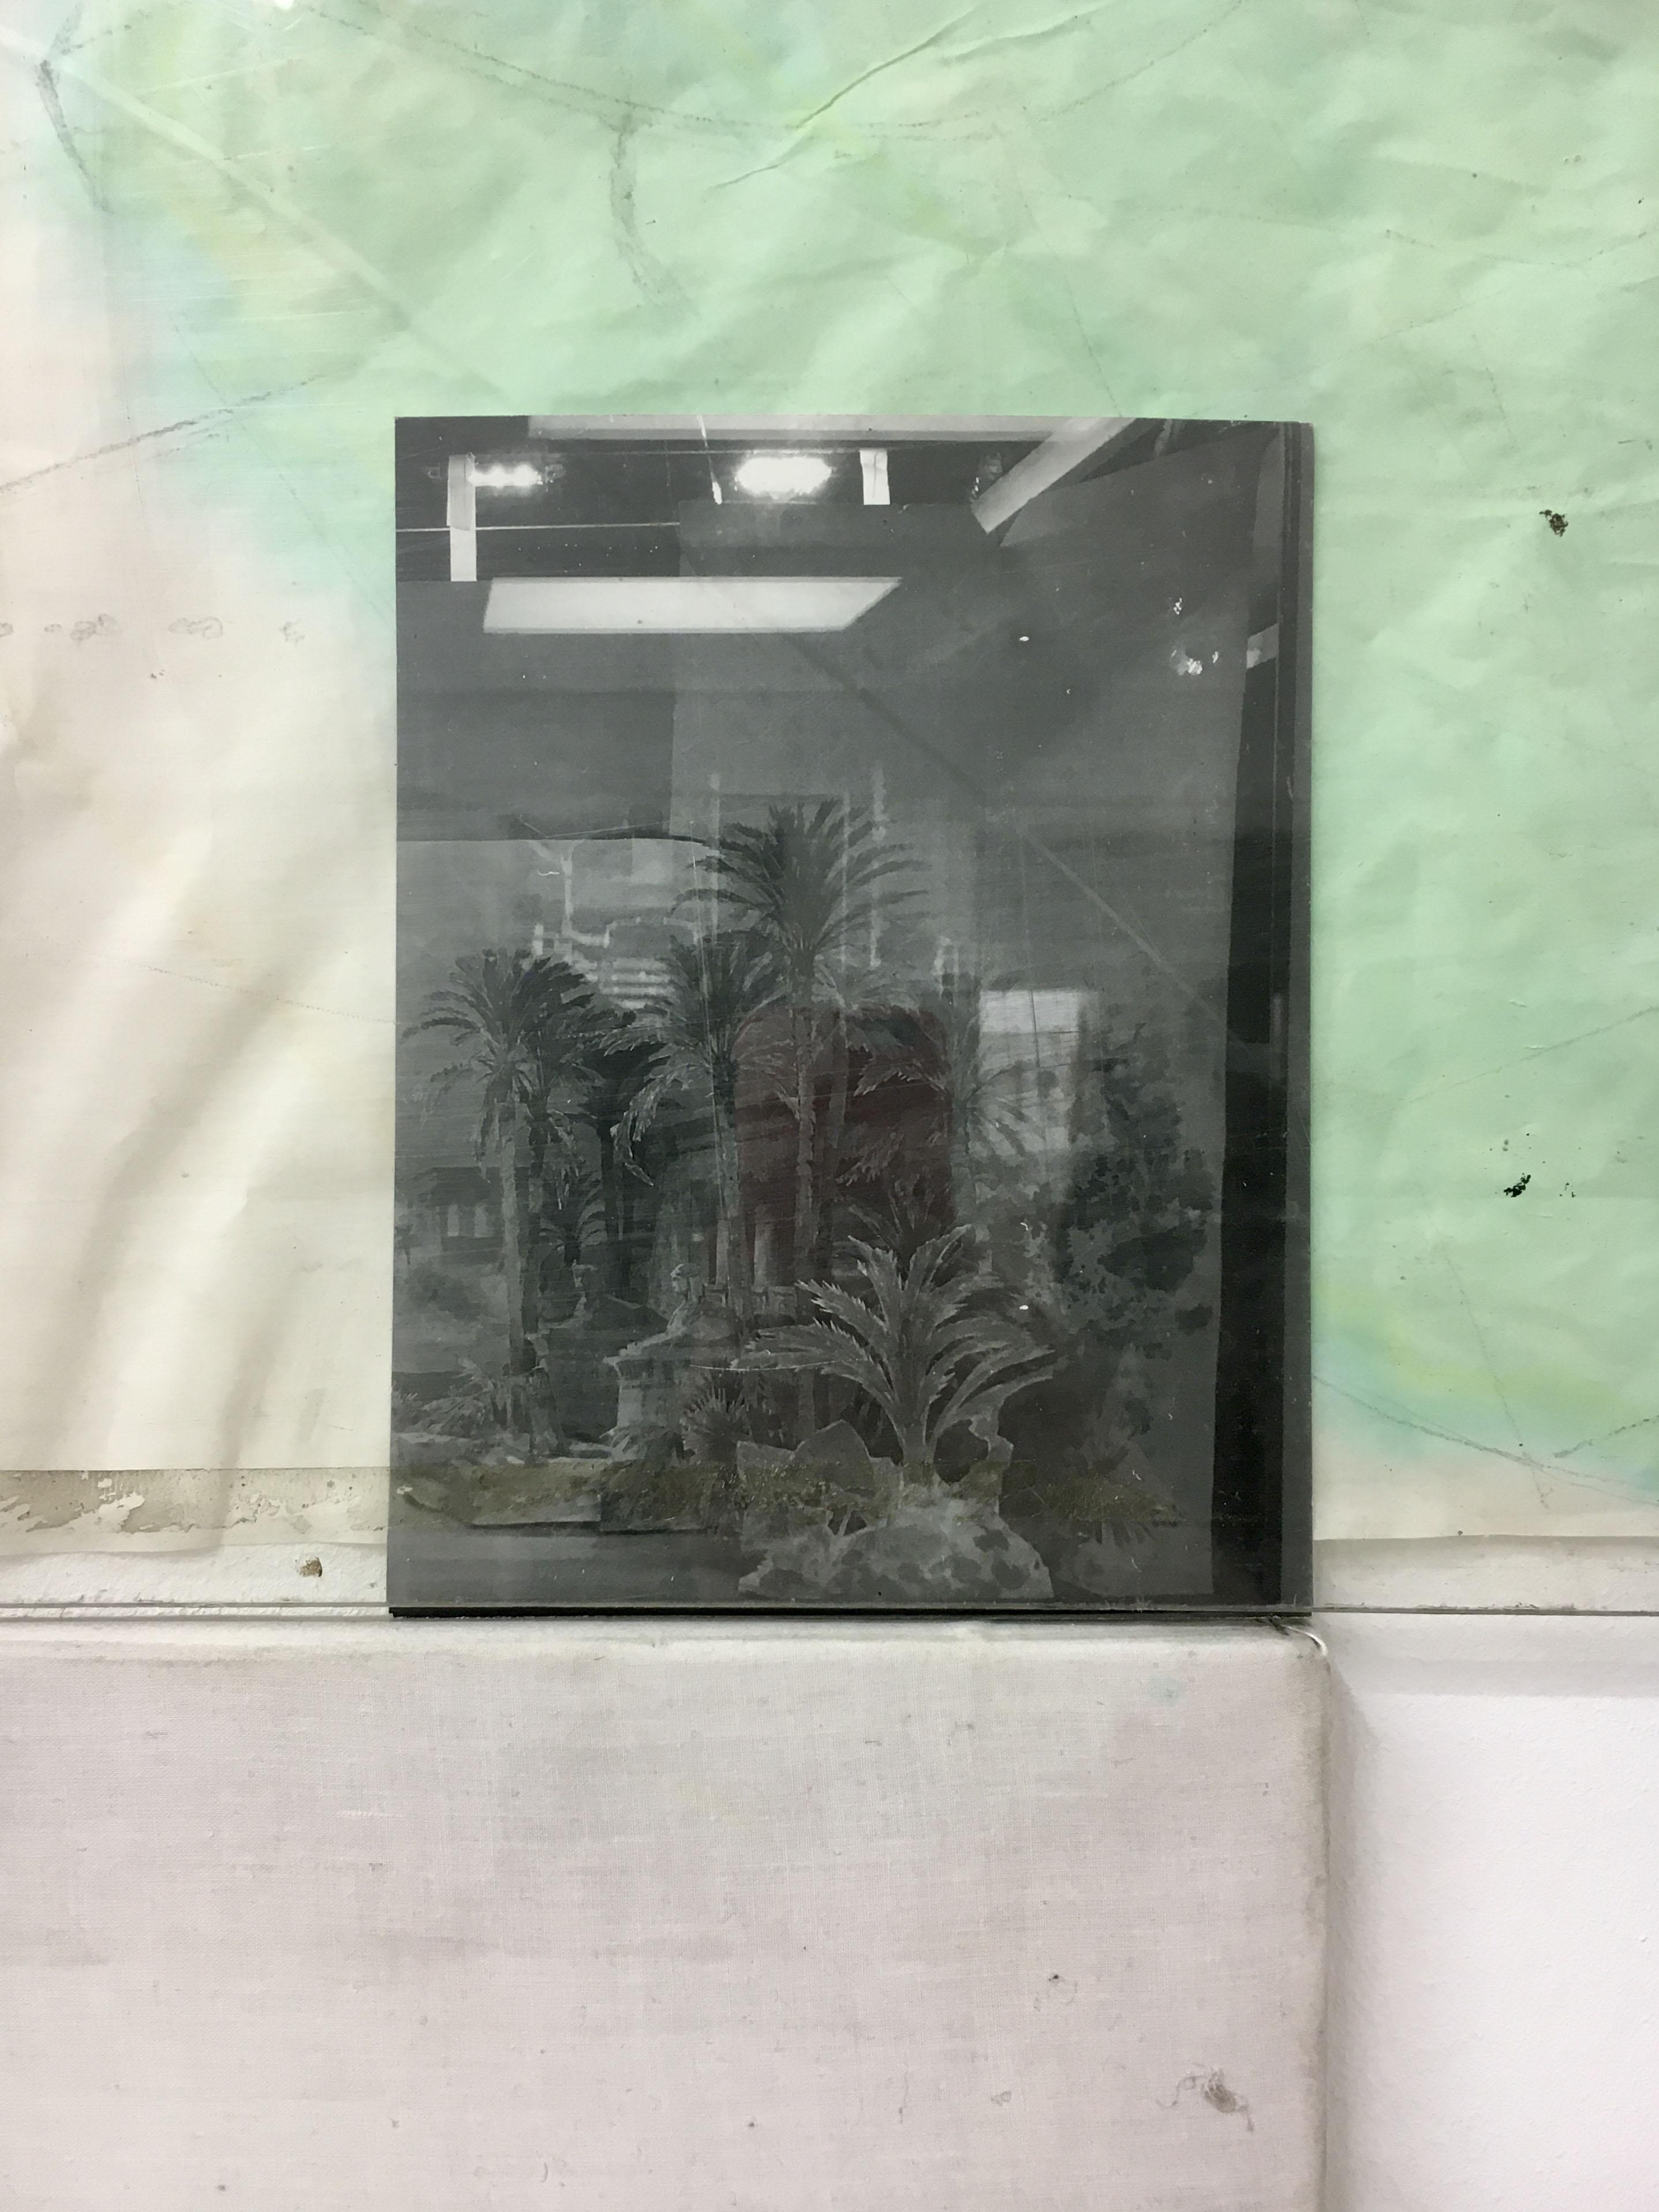 handlicher selbst geschossener spiegel nackt